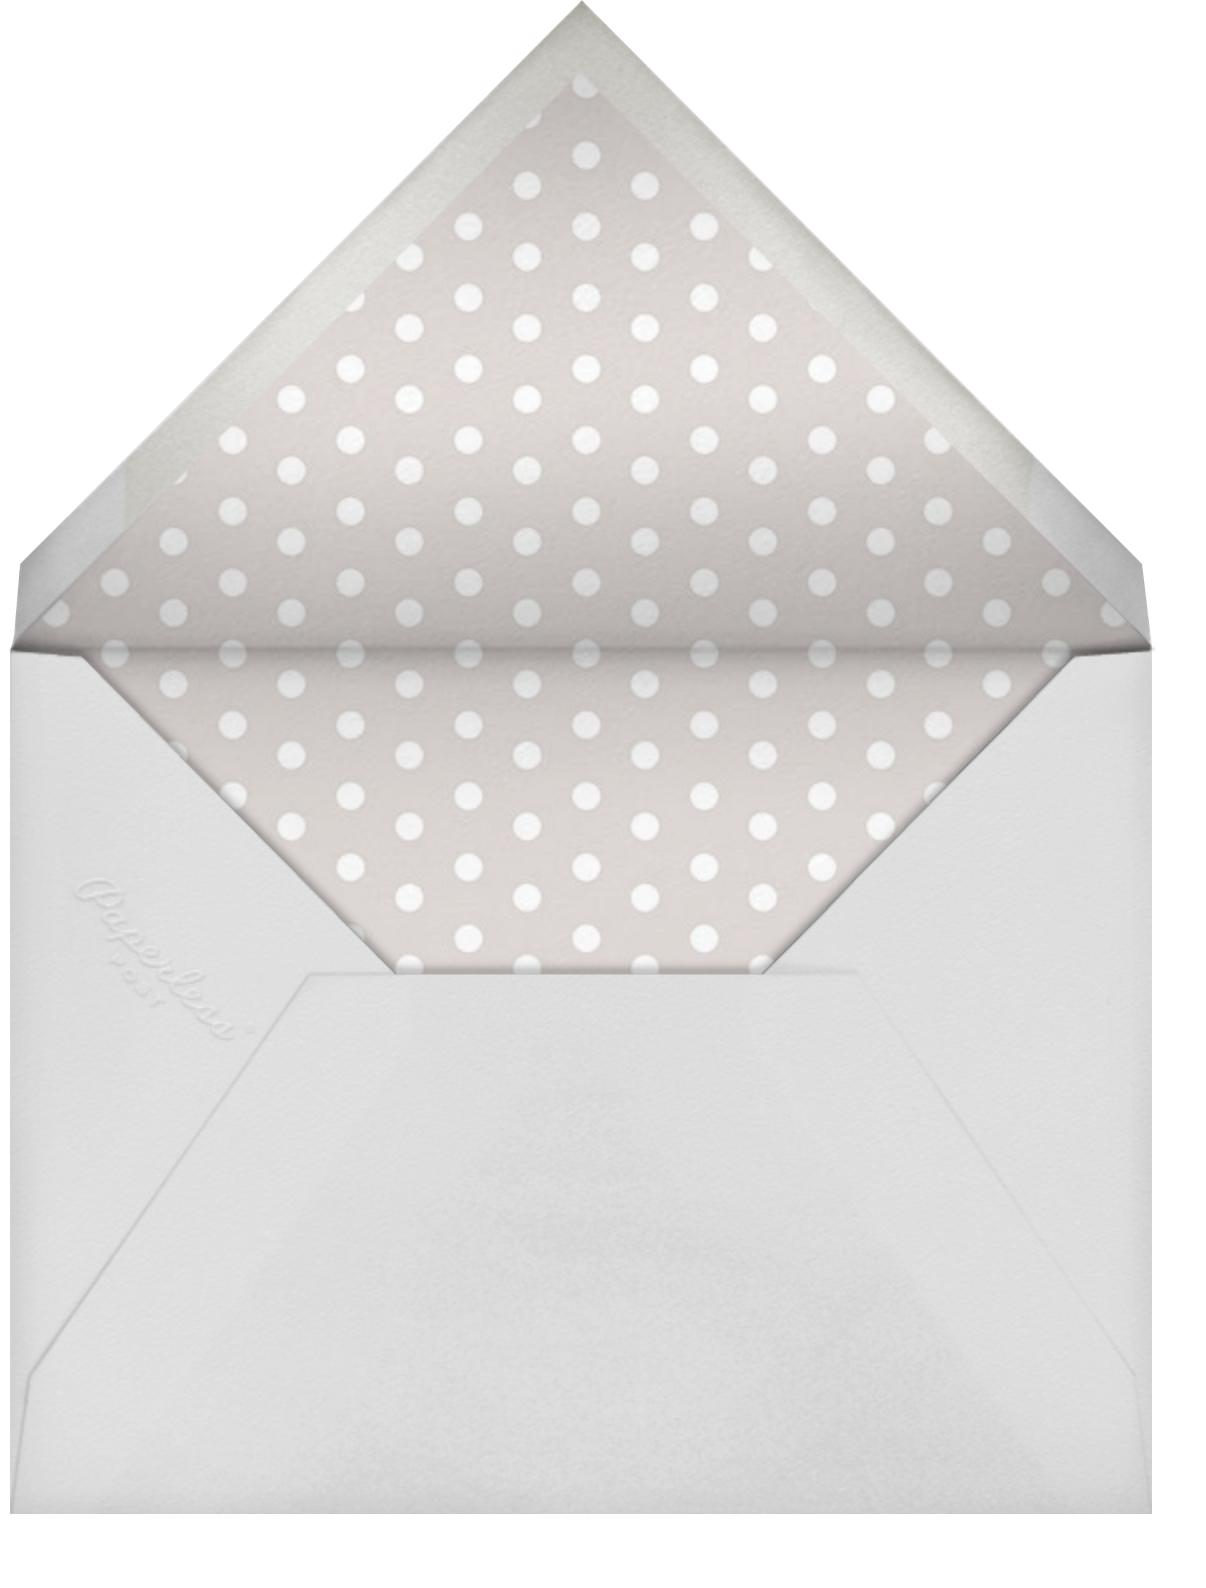 Indigo Sympathy - Rifle Paper Co. - Envelope